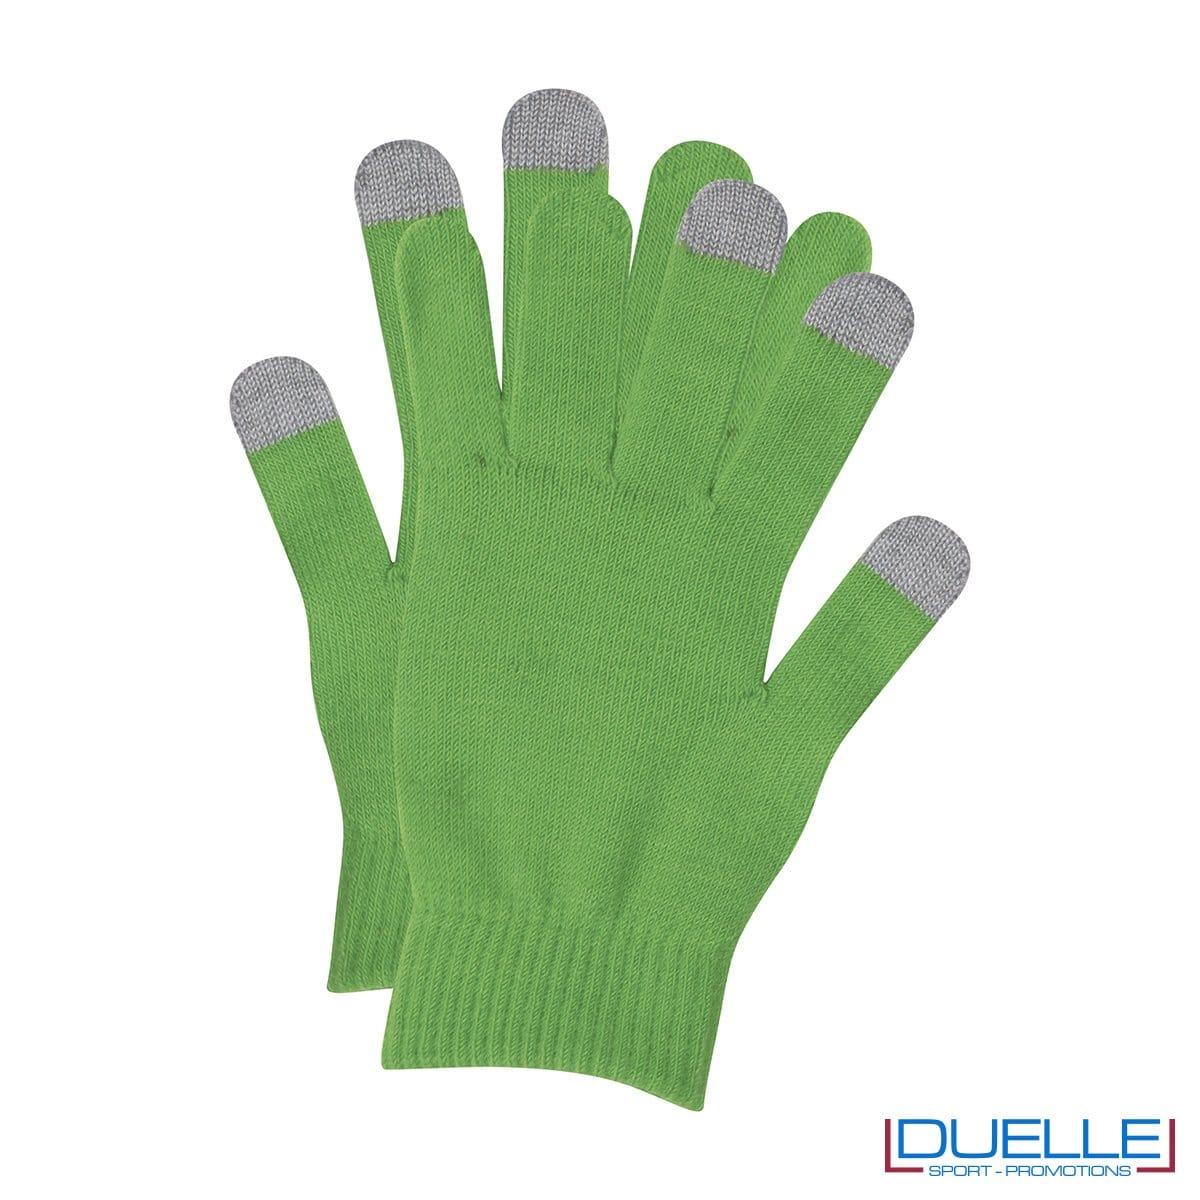 guanti touch screen personalizzati in colore verde